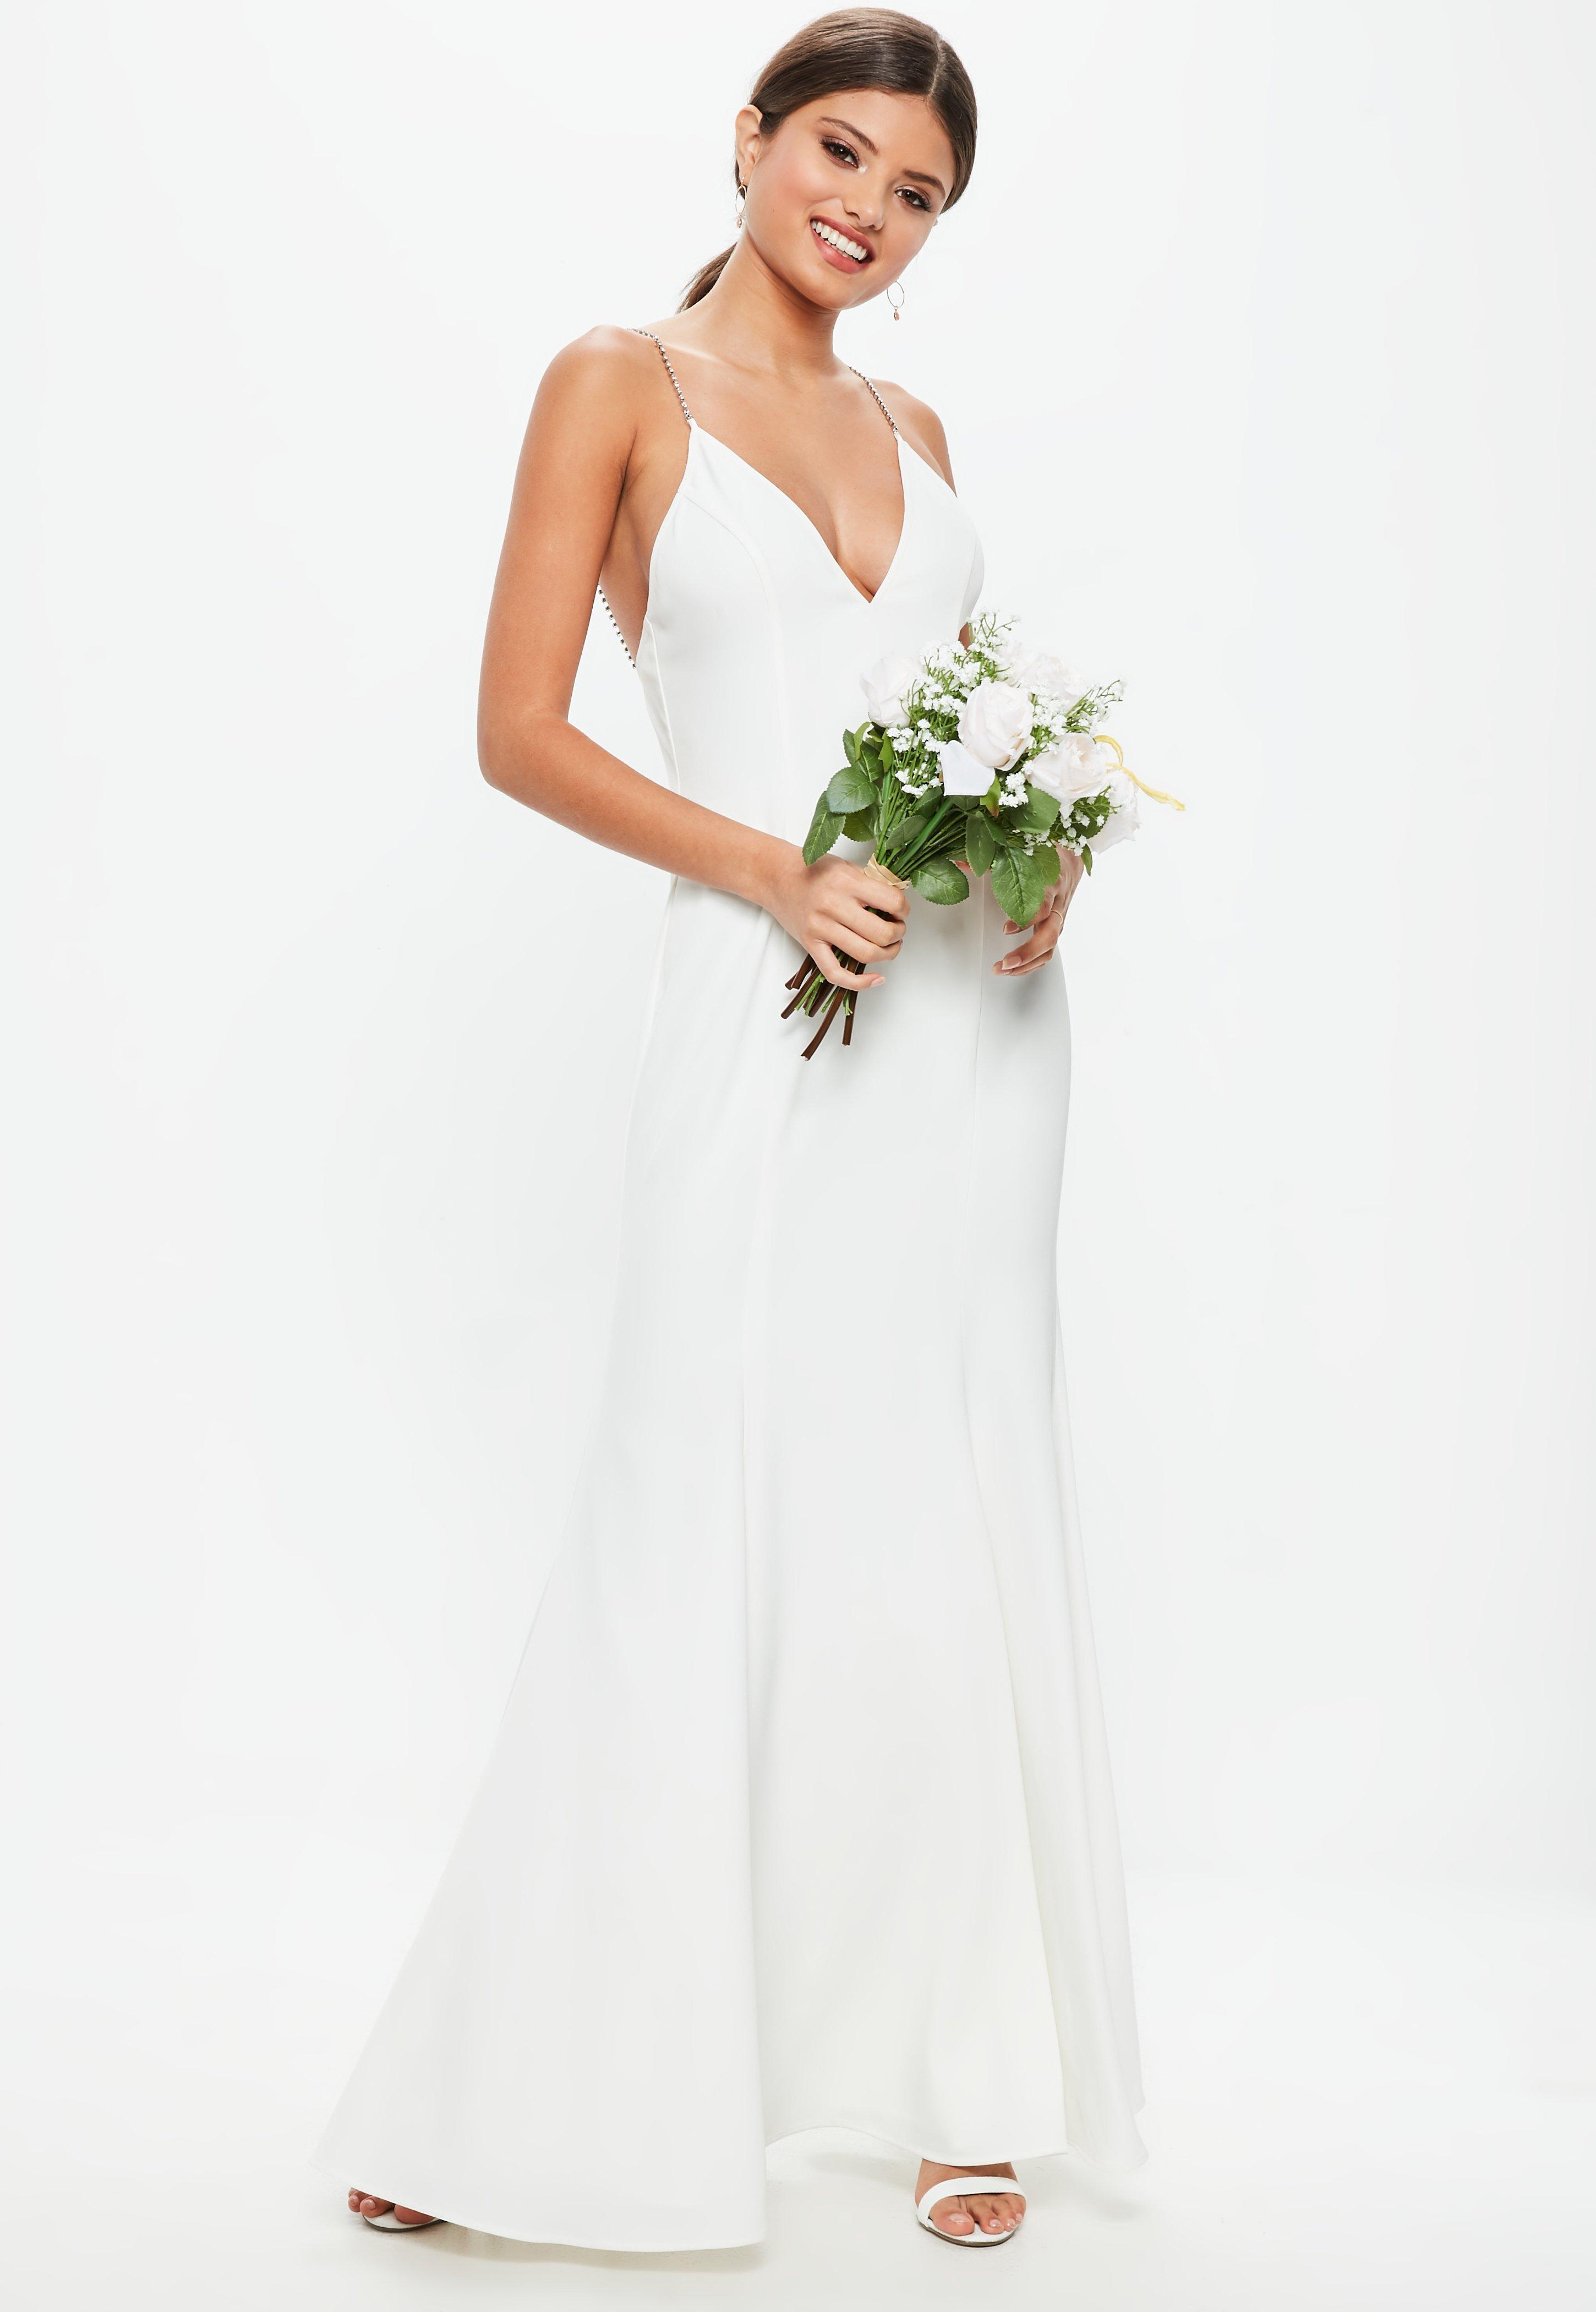 Lyst - Missguided Bridal White Diamante Strap Maxi Dress in White